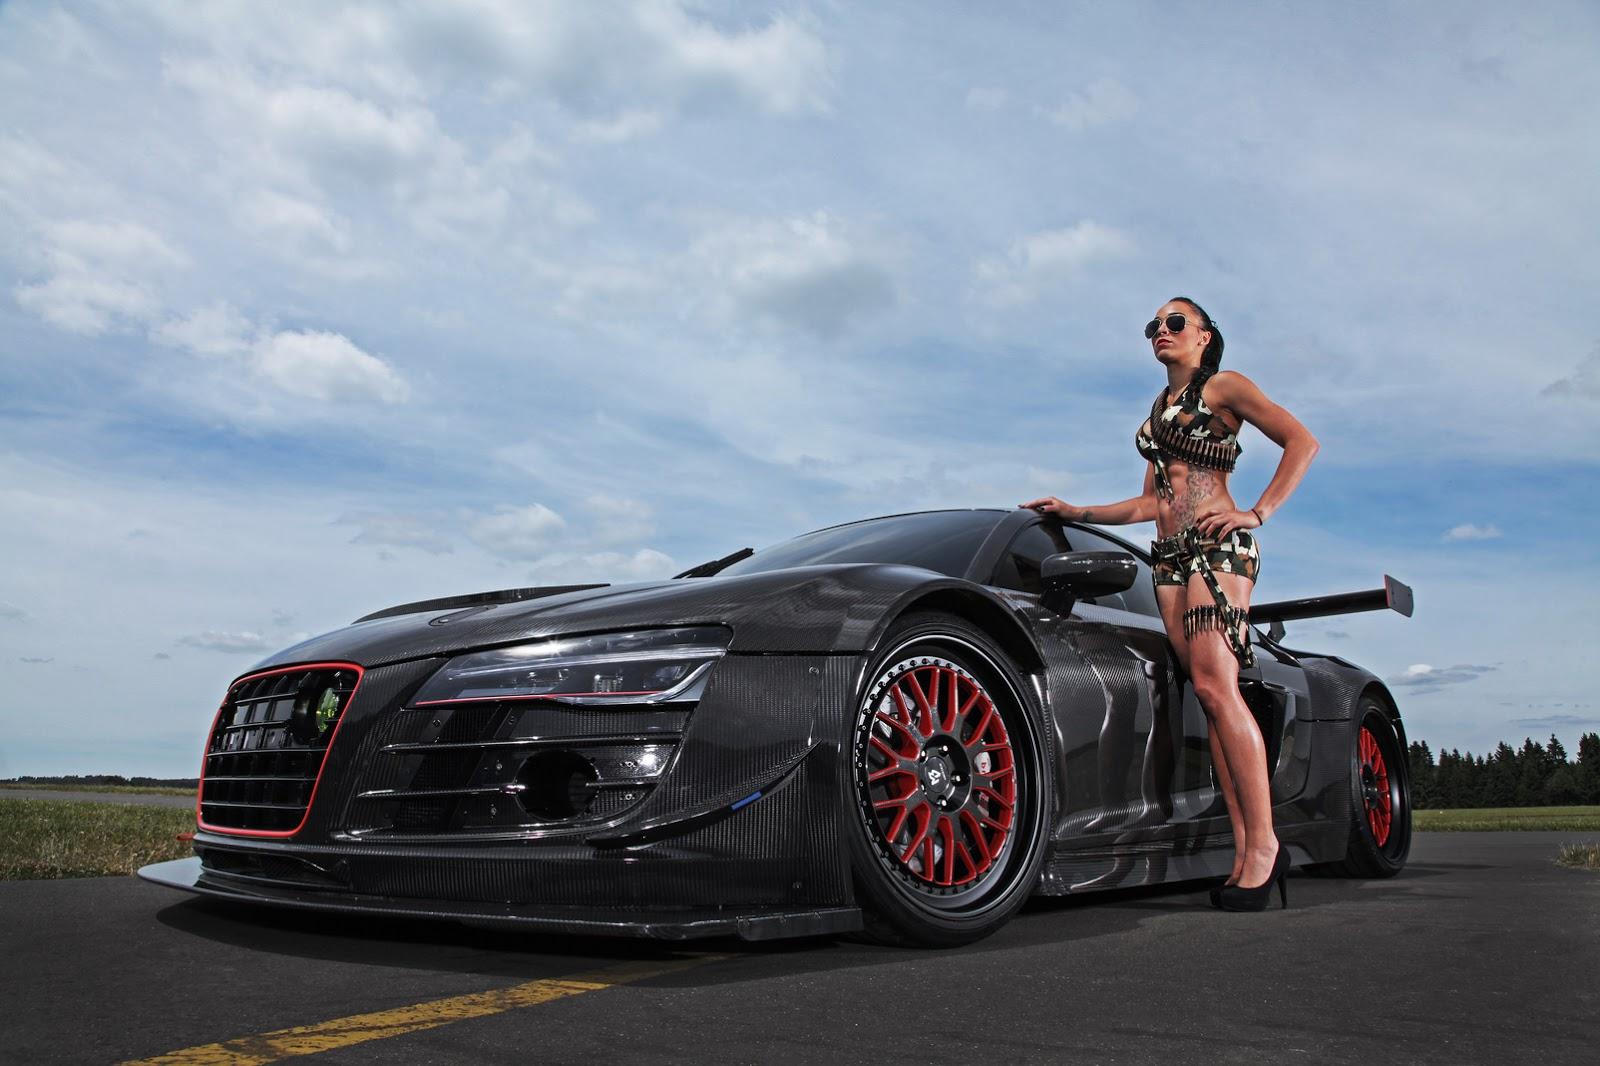 Audi-R8-Recon-MR8-5.jpg